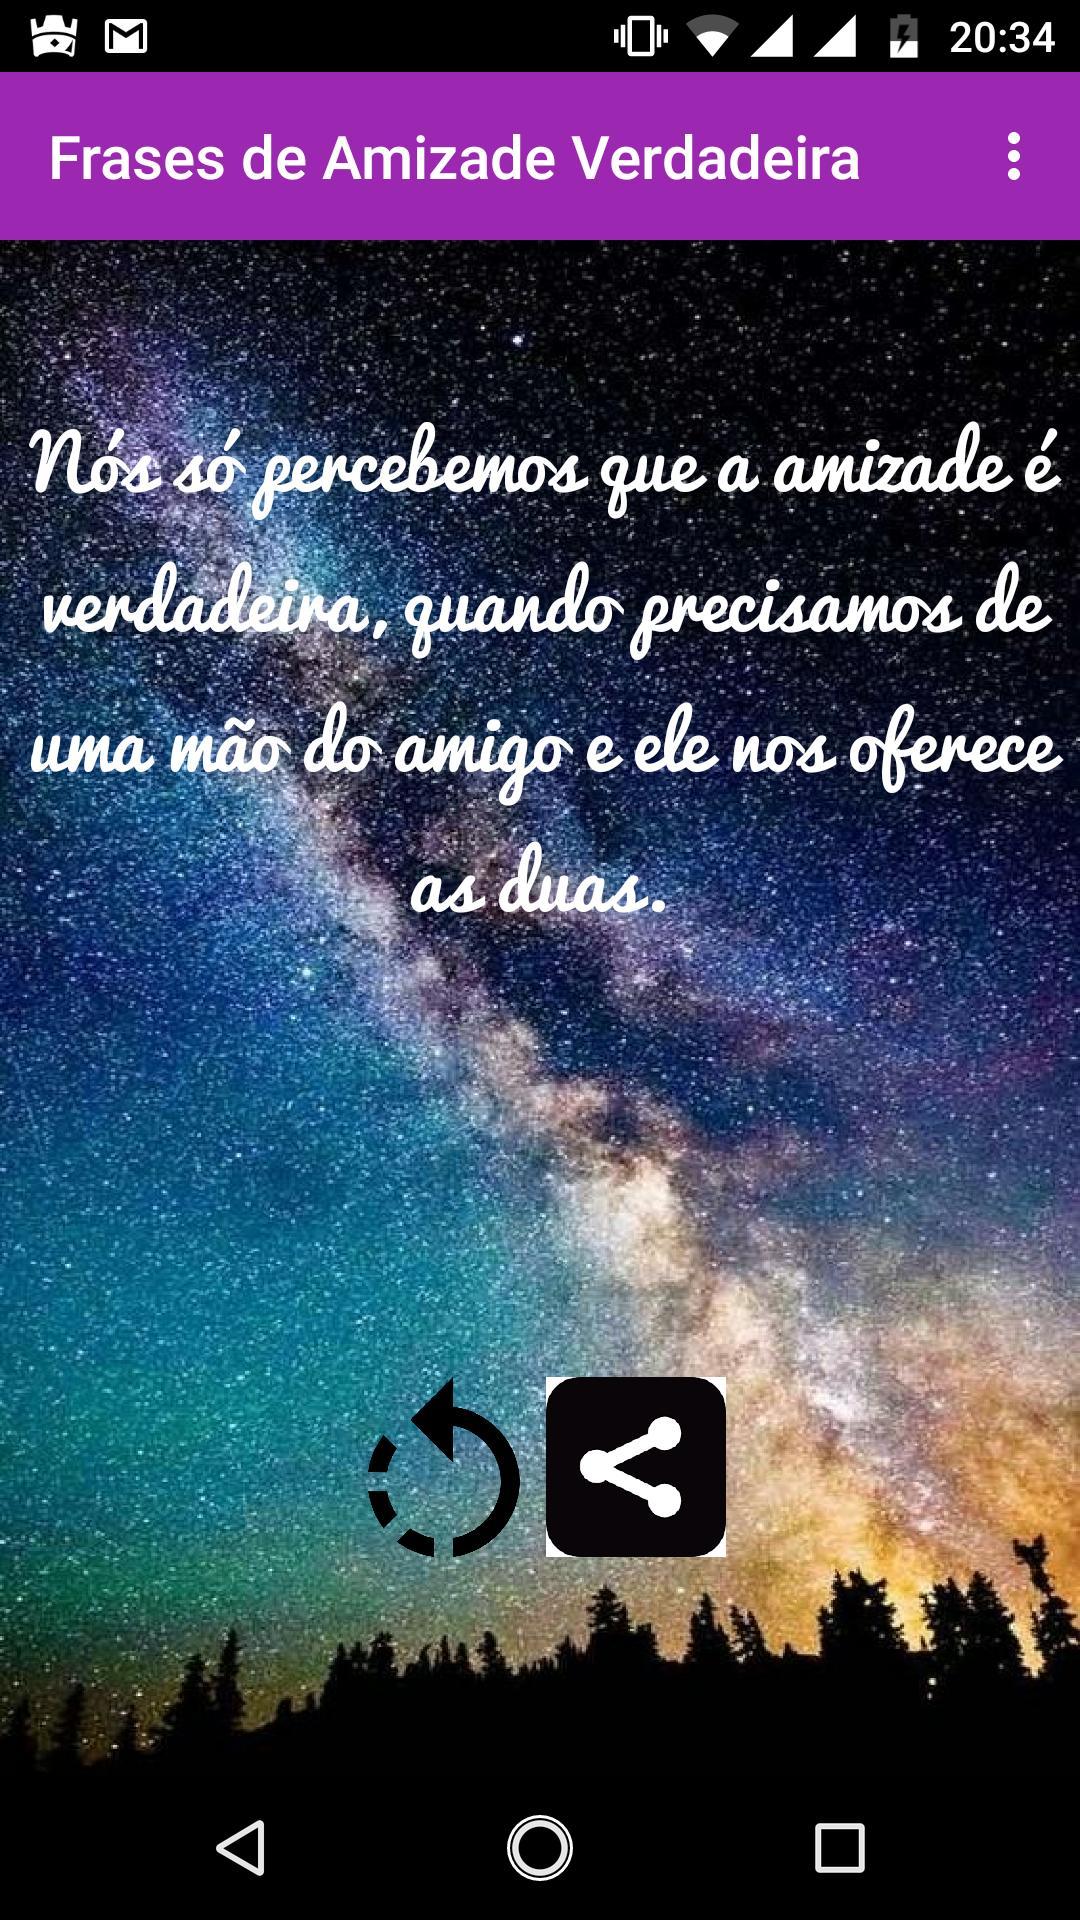 Frases De Amizade Verdadeira For Android Apk Download